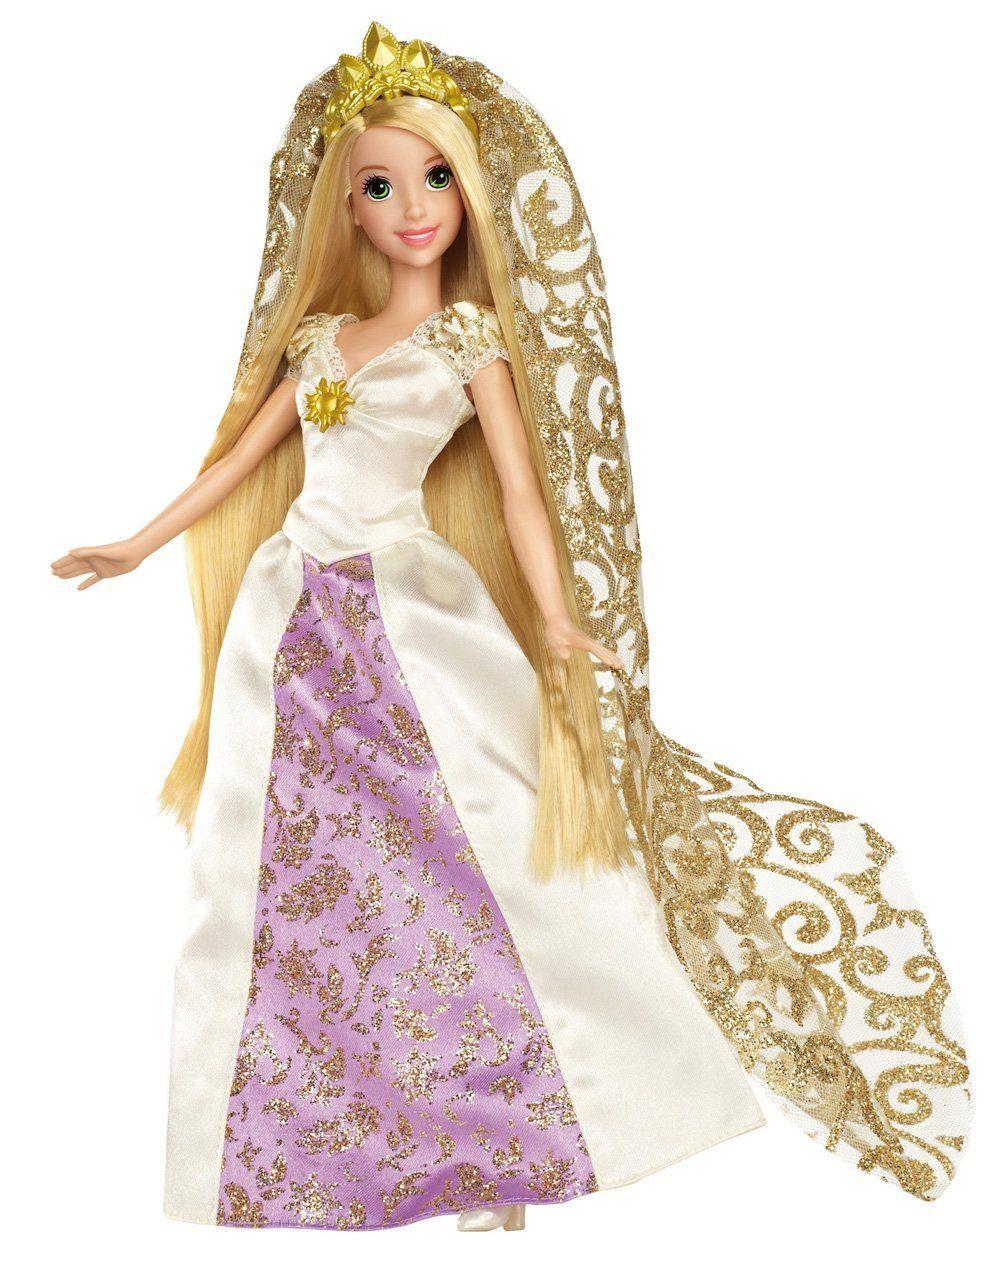 Disney Princess Rapunzel Bridal Doll | Barbie Playline Dolls ...